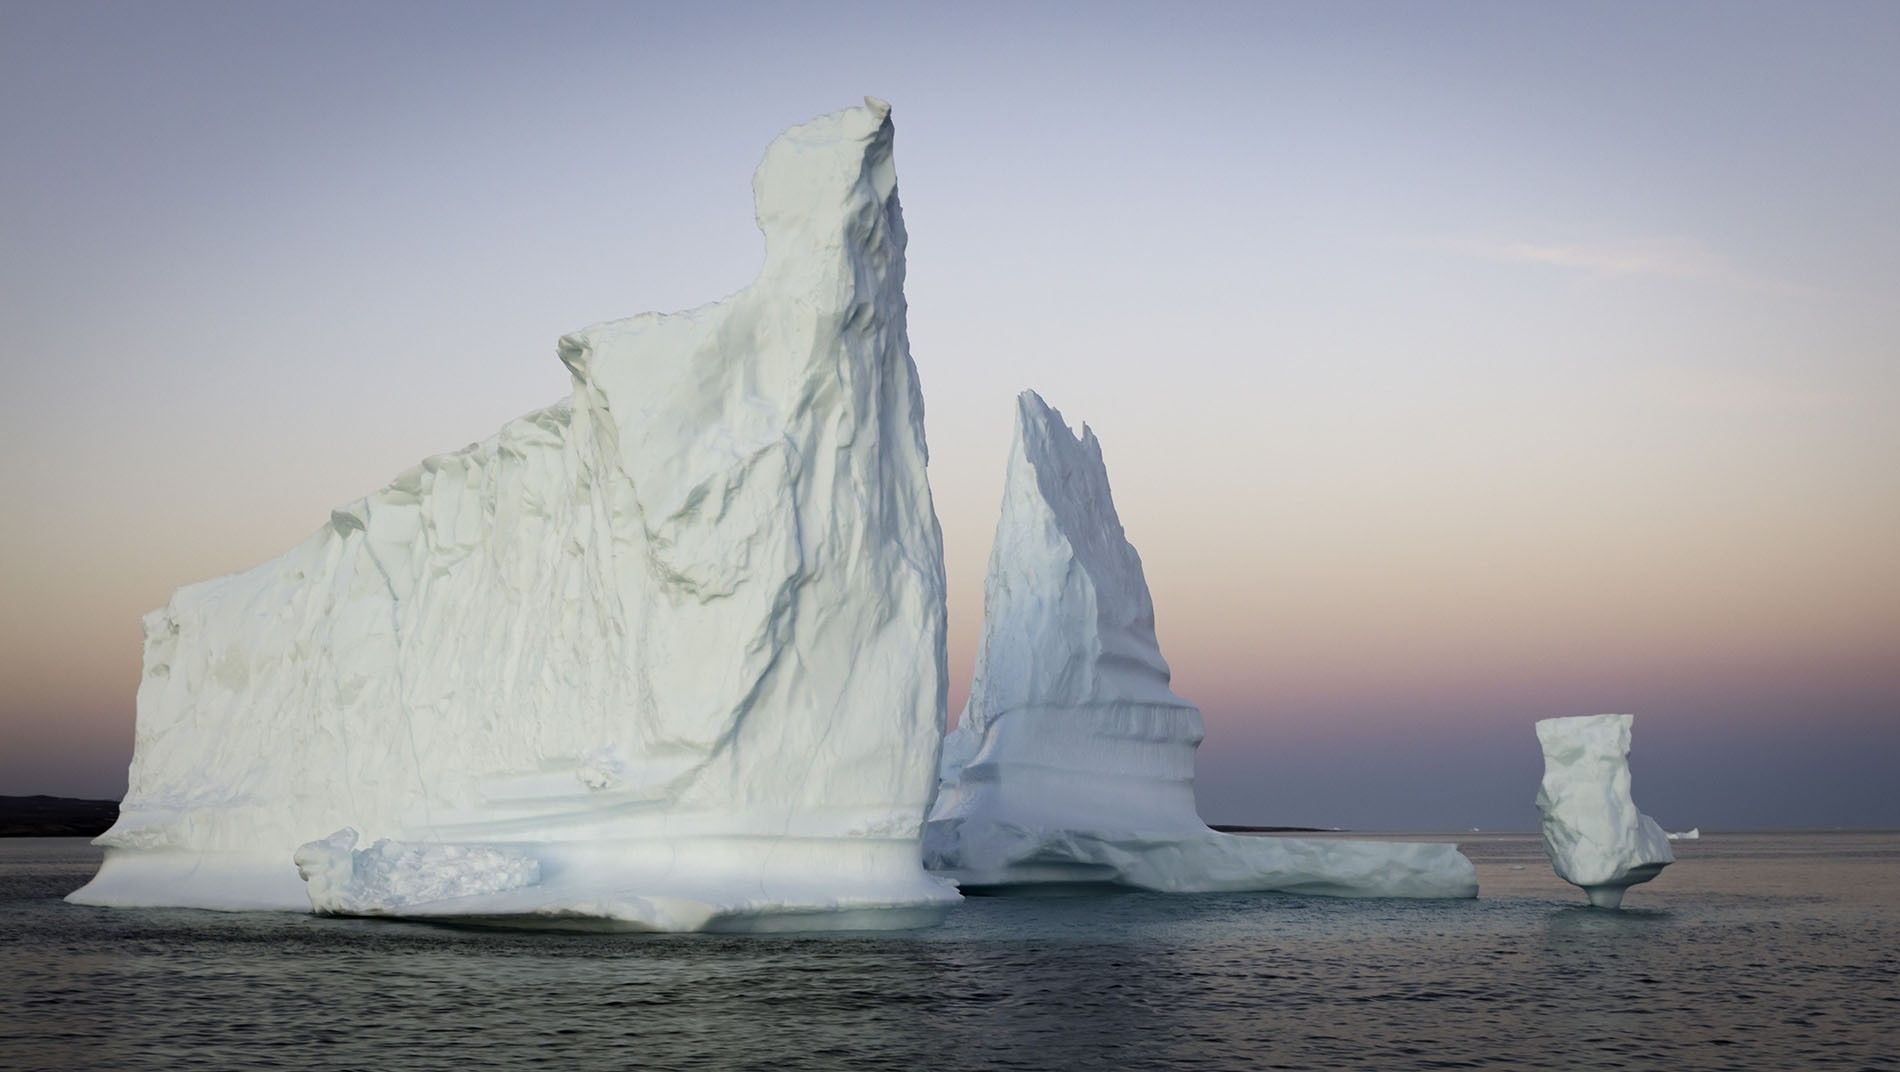 Icebergs in Greenland's Scoresby Sound